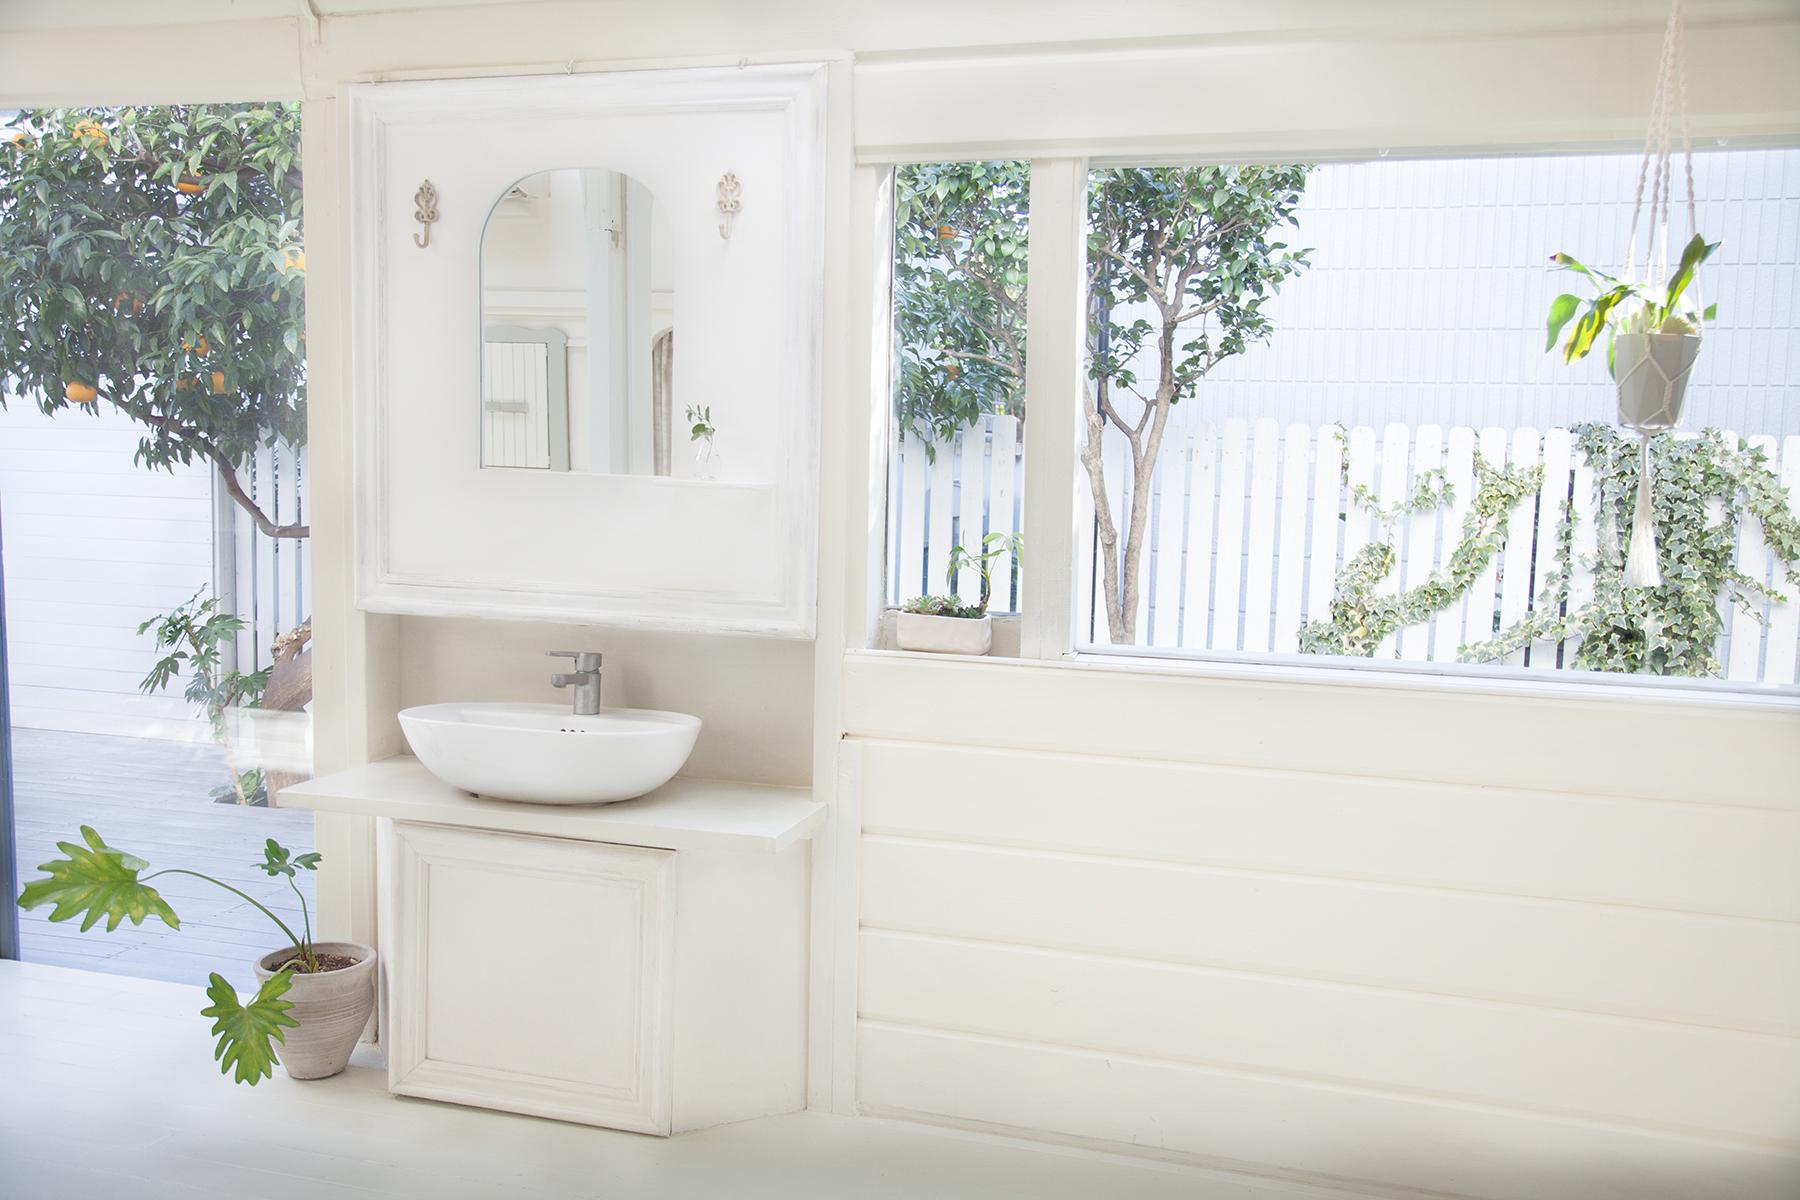 Rapture Studio (ラプチャースタジオ)洗面台の鏡設置・要予約